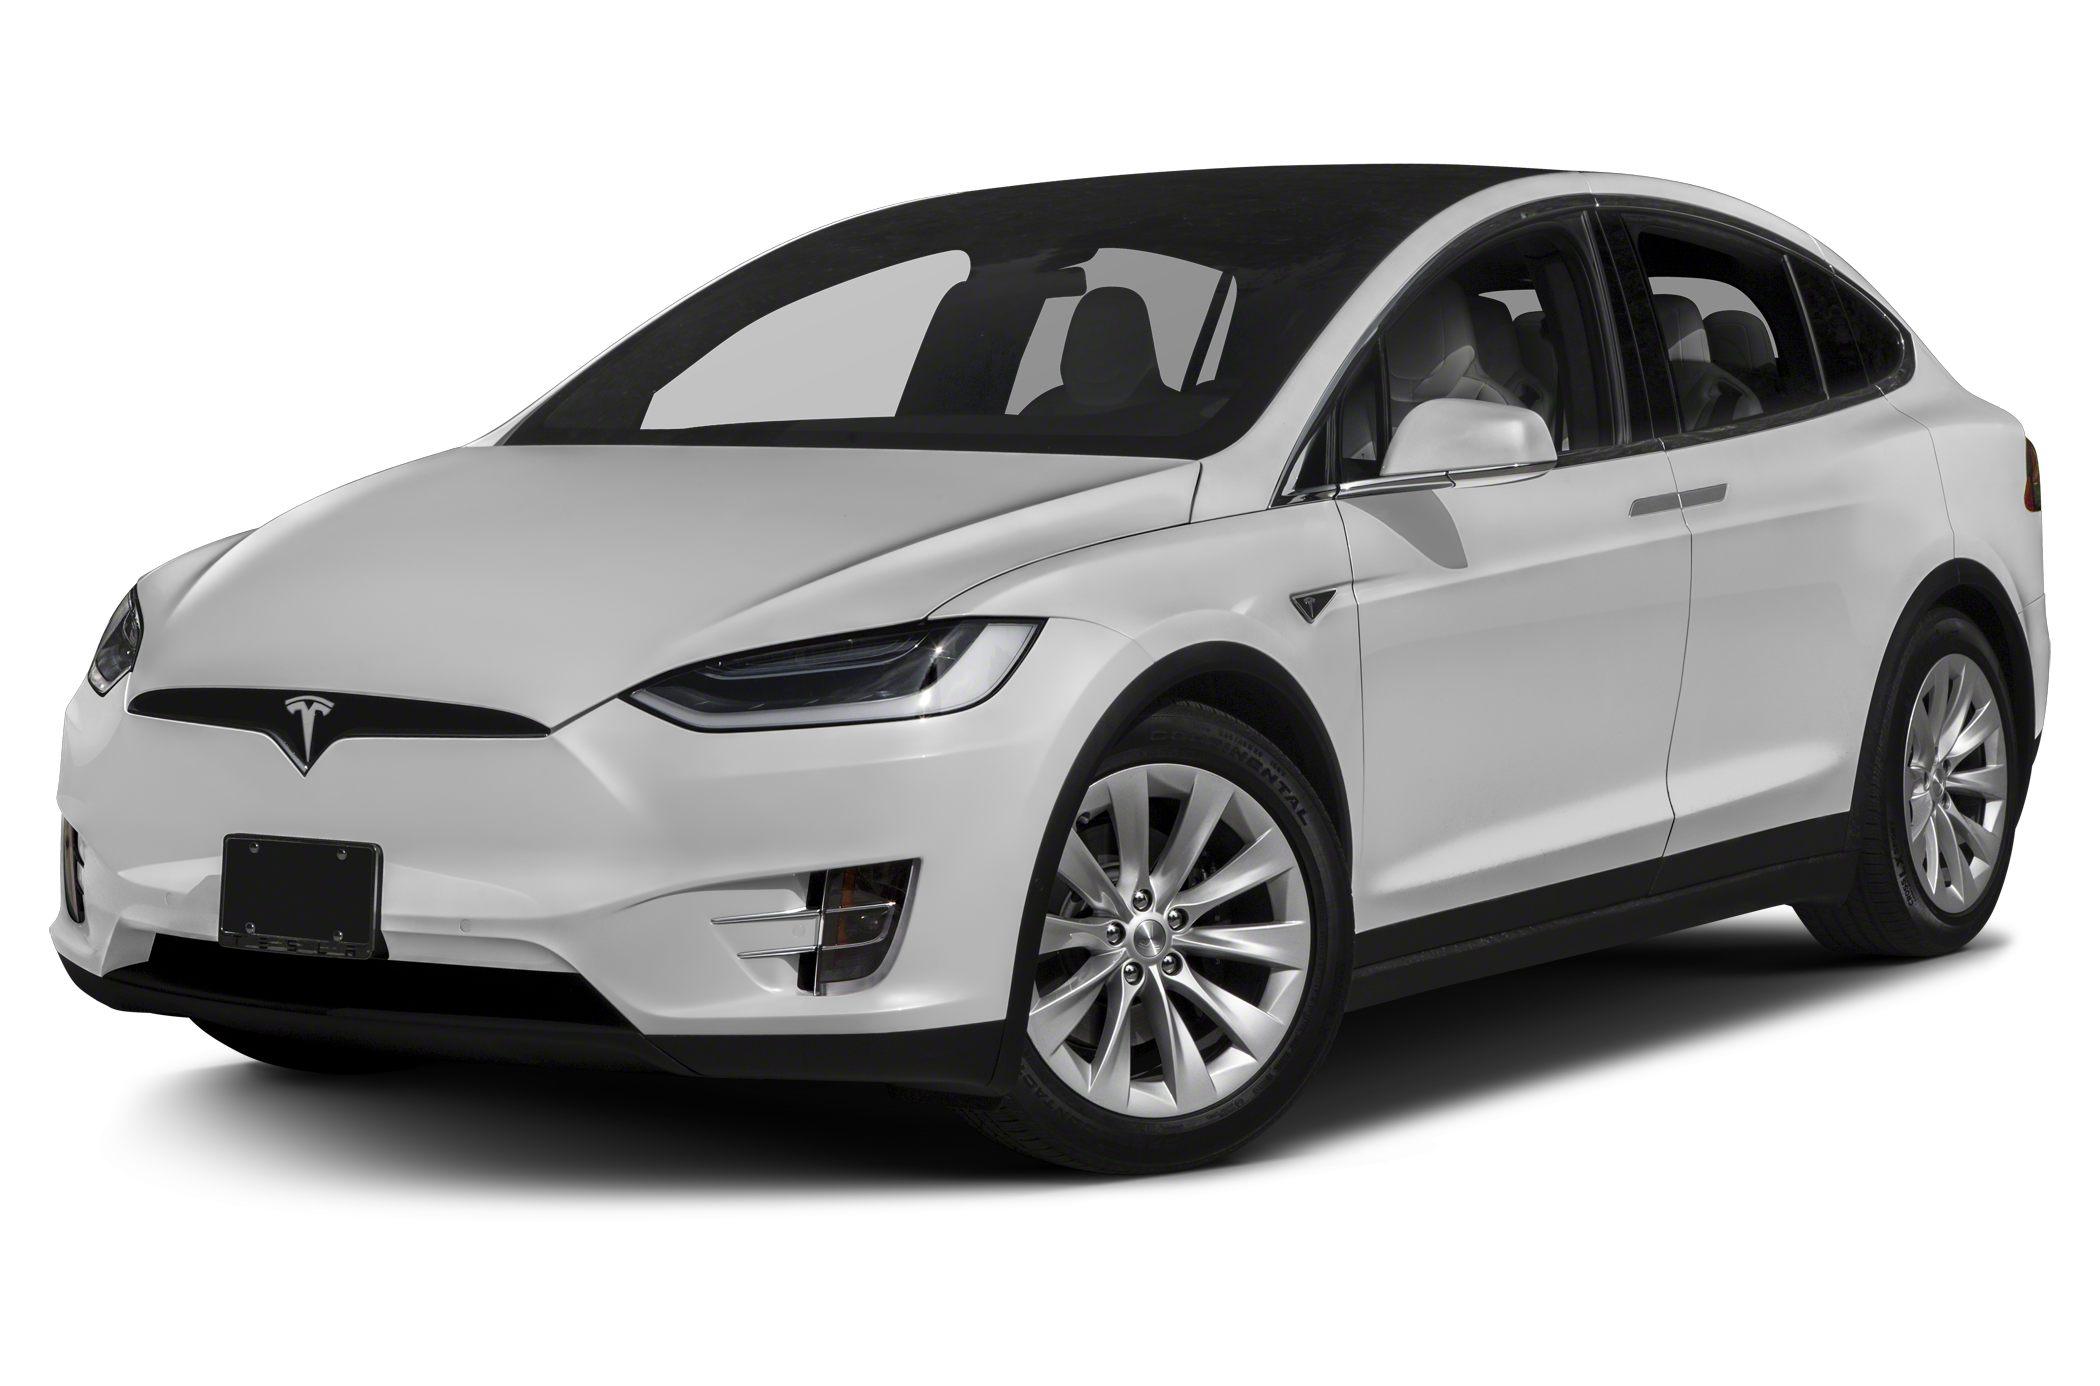 Punto de recarga Tesla Model X